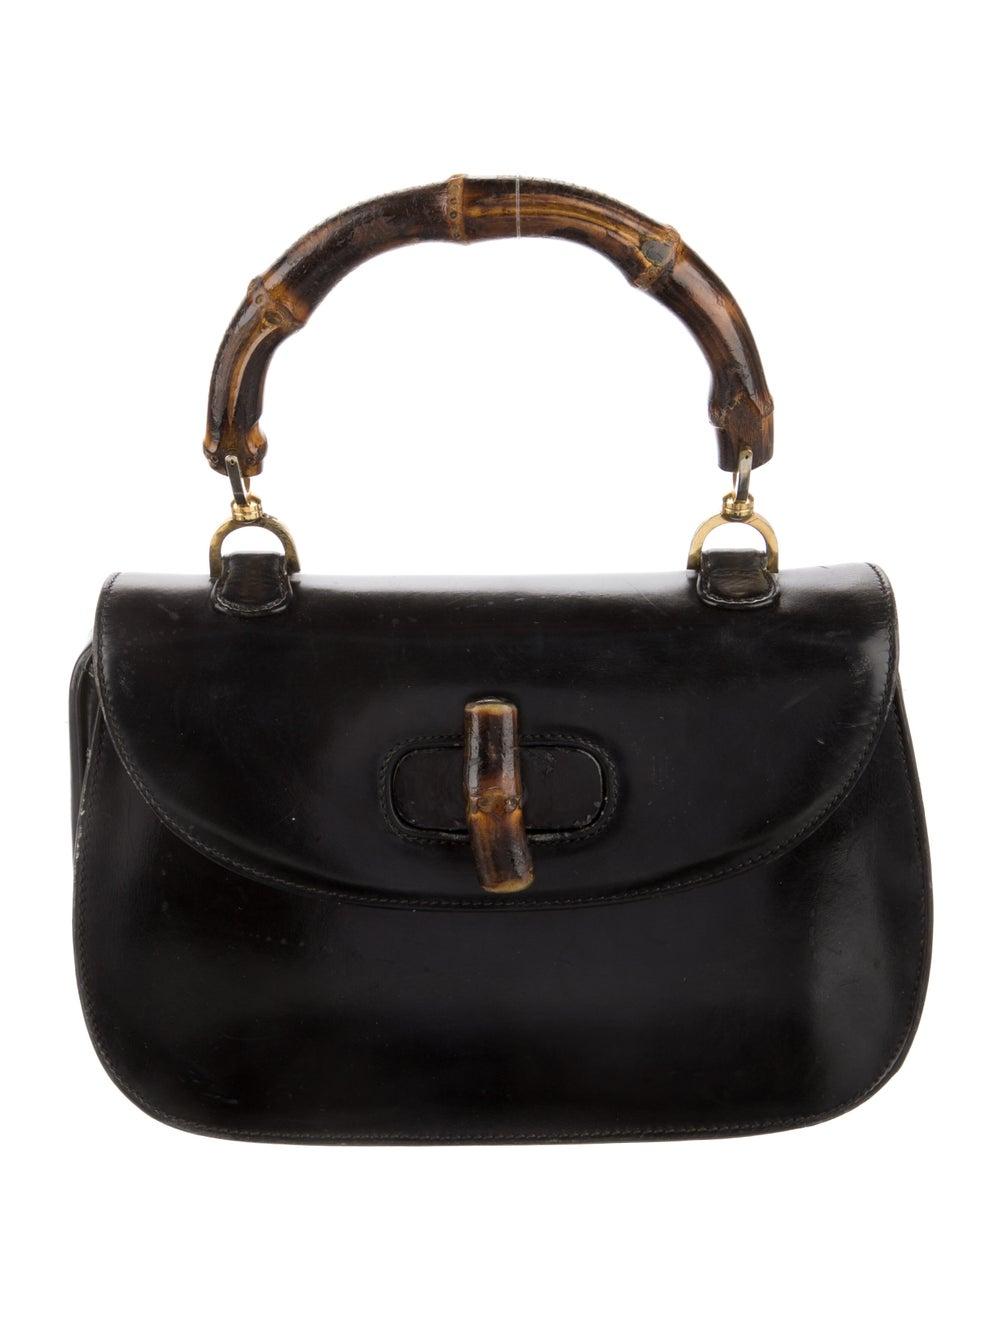 Gucci Vintage Leather Bamboo Top Handle Bag Black - image 1